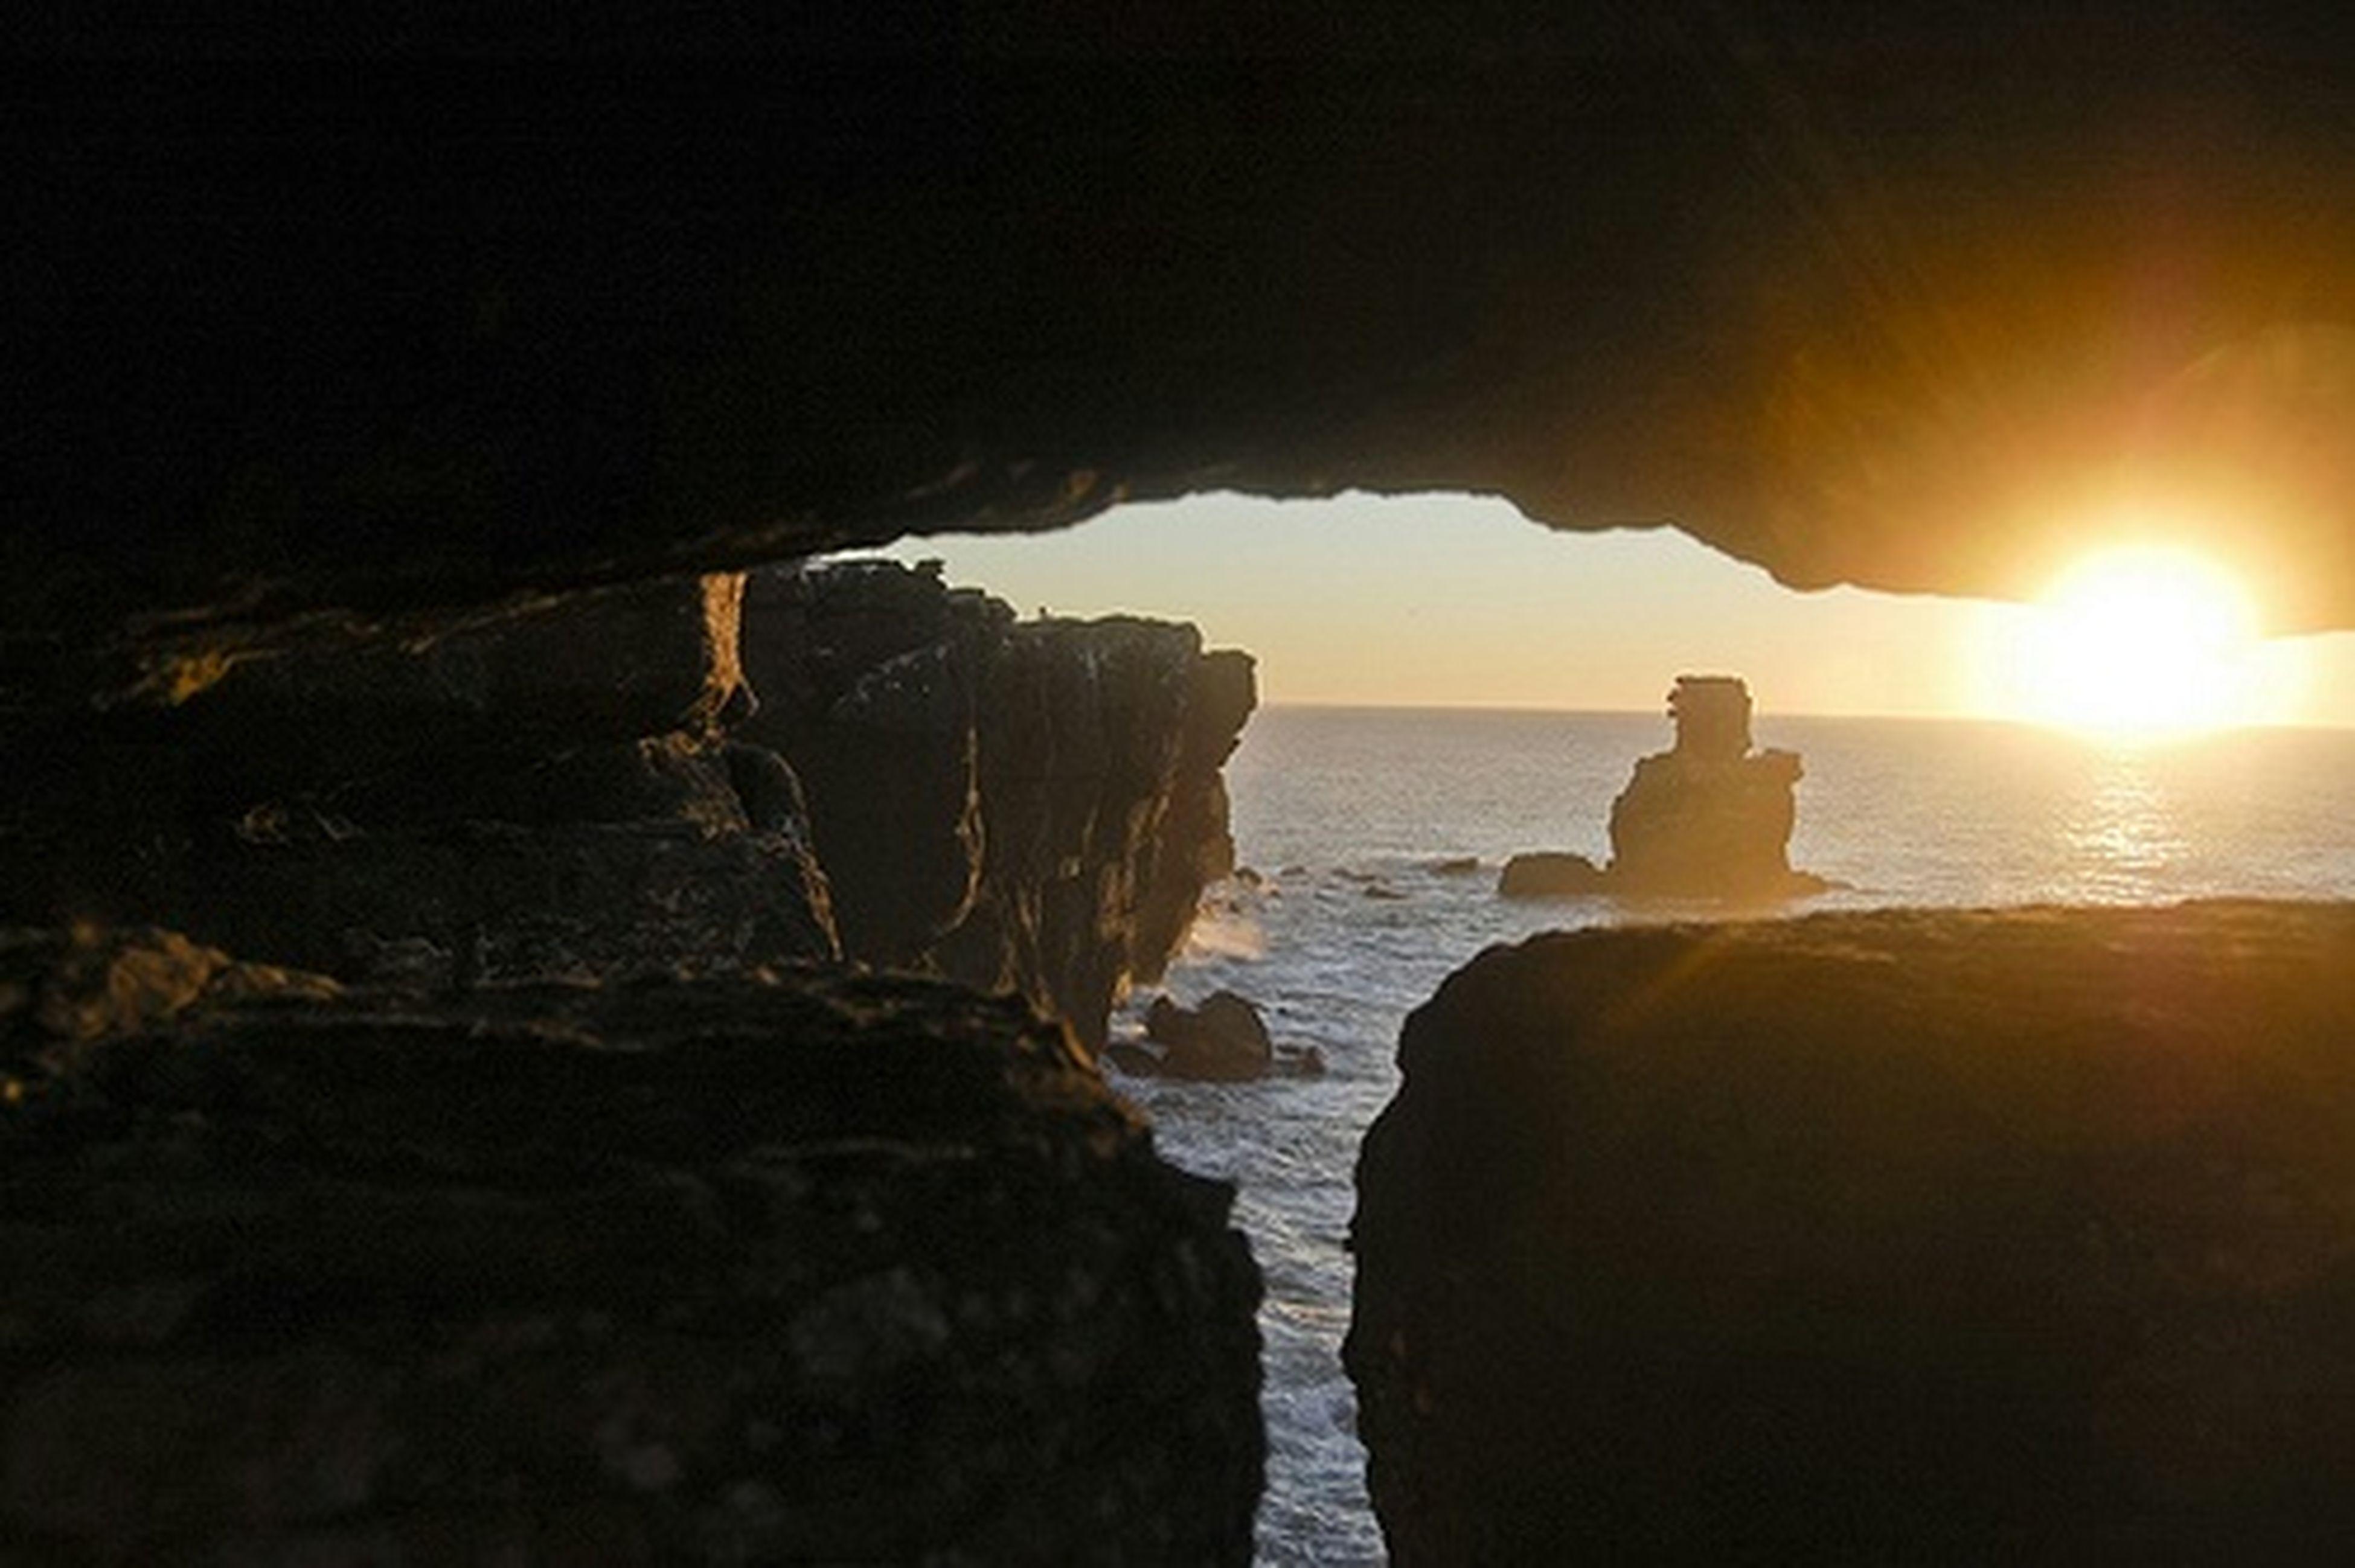 water, sea, sunset, sun, scenics, rock - object, tranquil scene, horizon over water, tranquility, beauty in nature, rock formation, sky, nature, idyllic, sunlight, beach, sunbeam, reflection, rock, shore